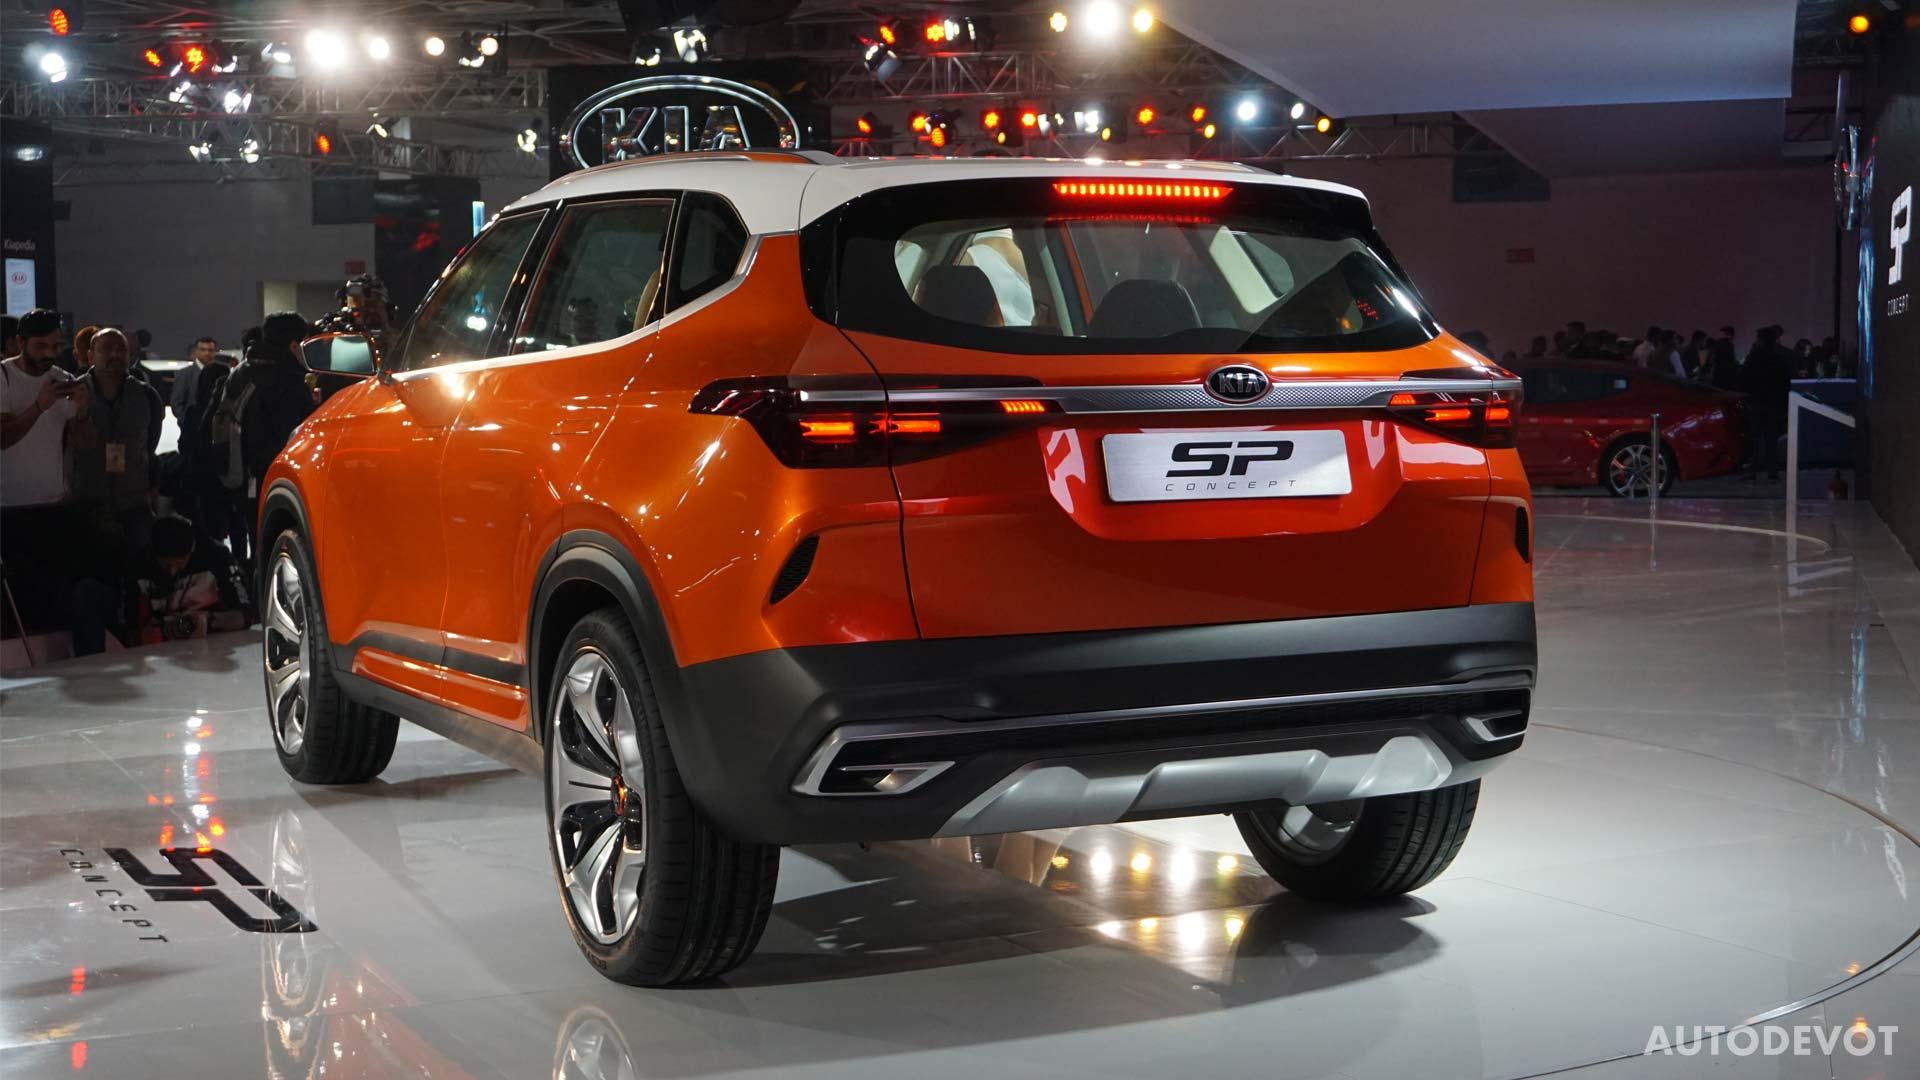 Kia-SP-Concept-Auto-Expo-2018_3